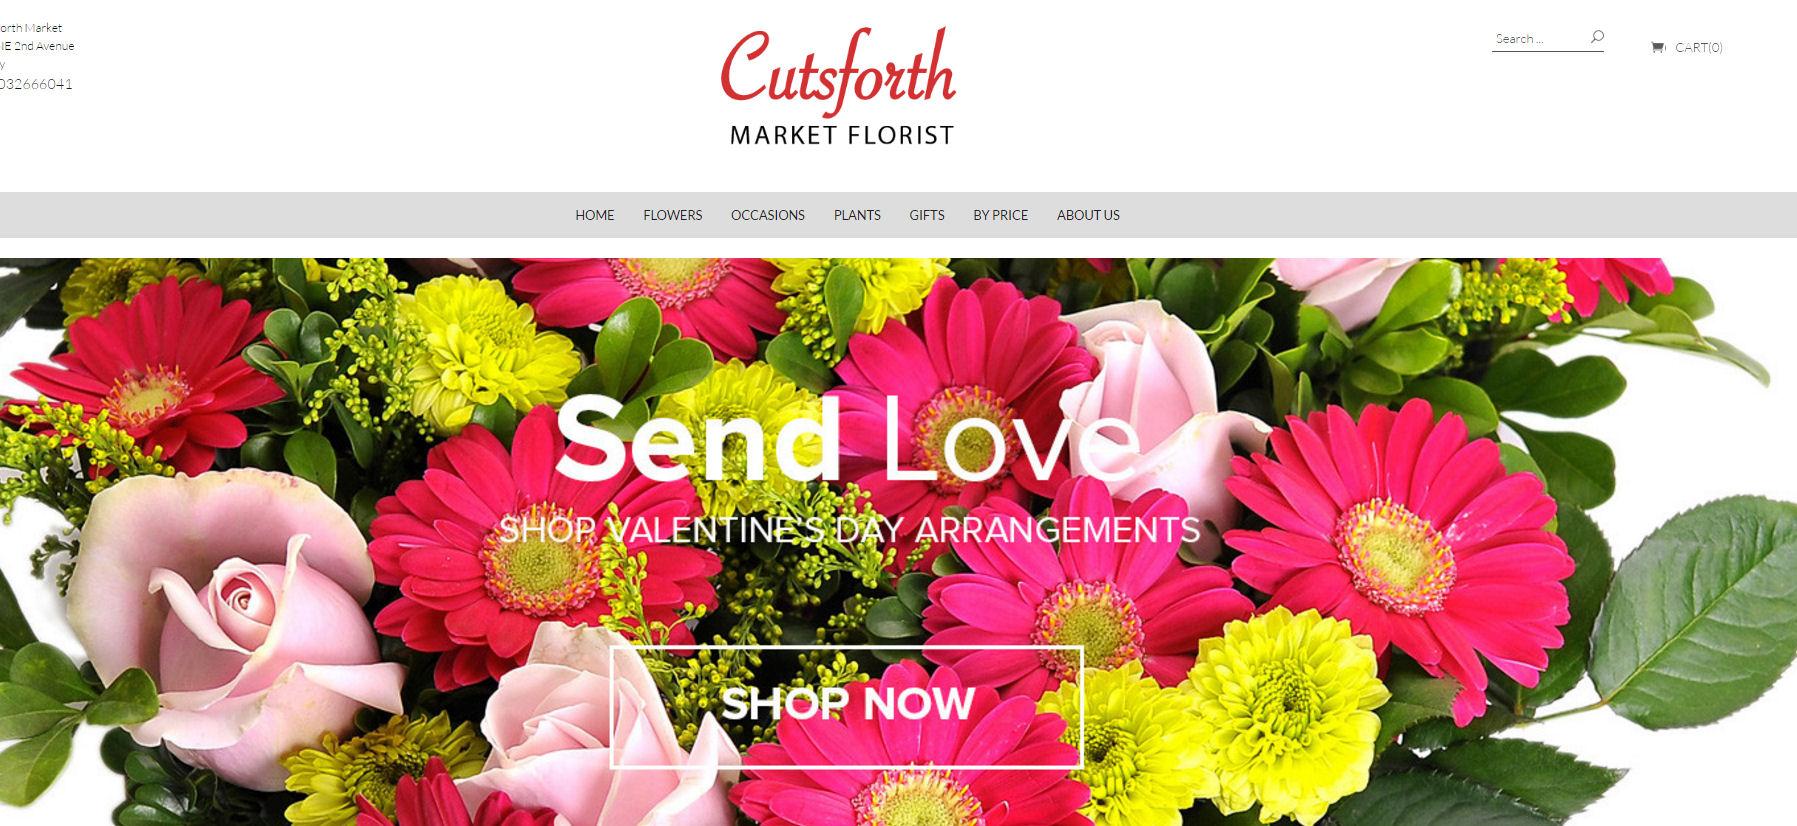 Cutsforth's Market Floral